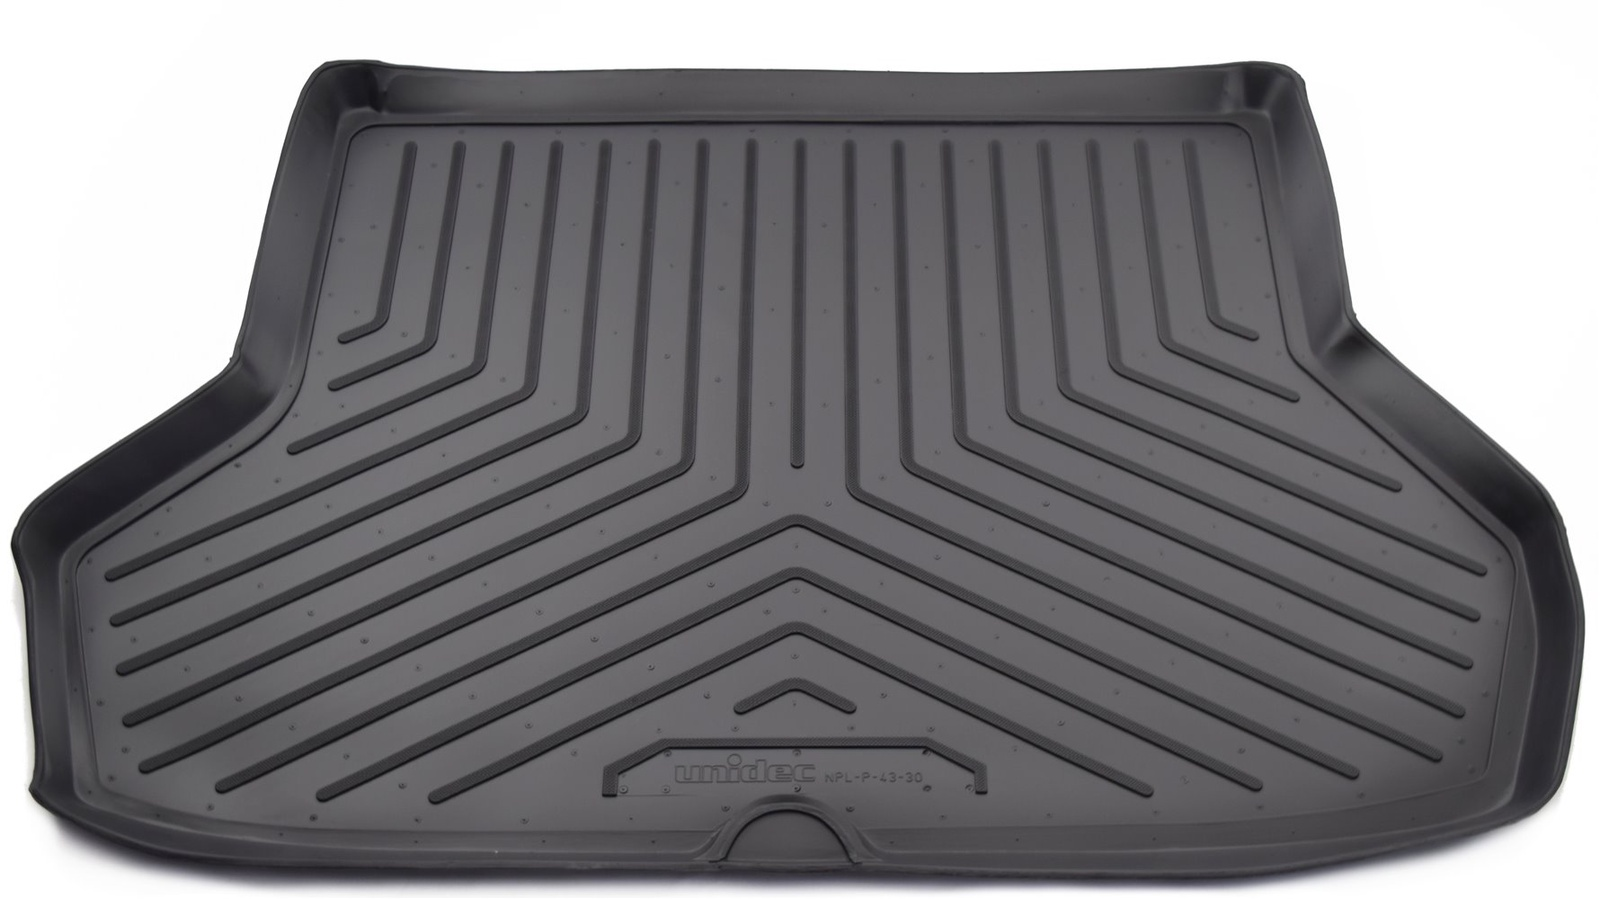 Коврик багажника Norplast для Kia Rio DC SD 2000-2005, NPL-P-43-30, черный